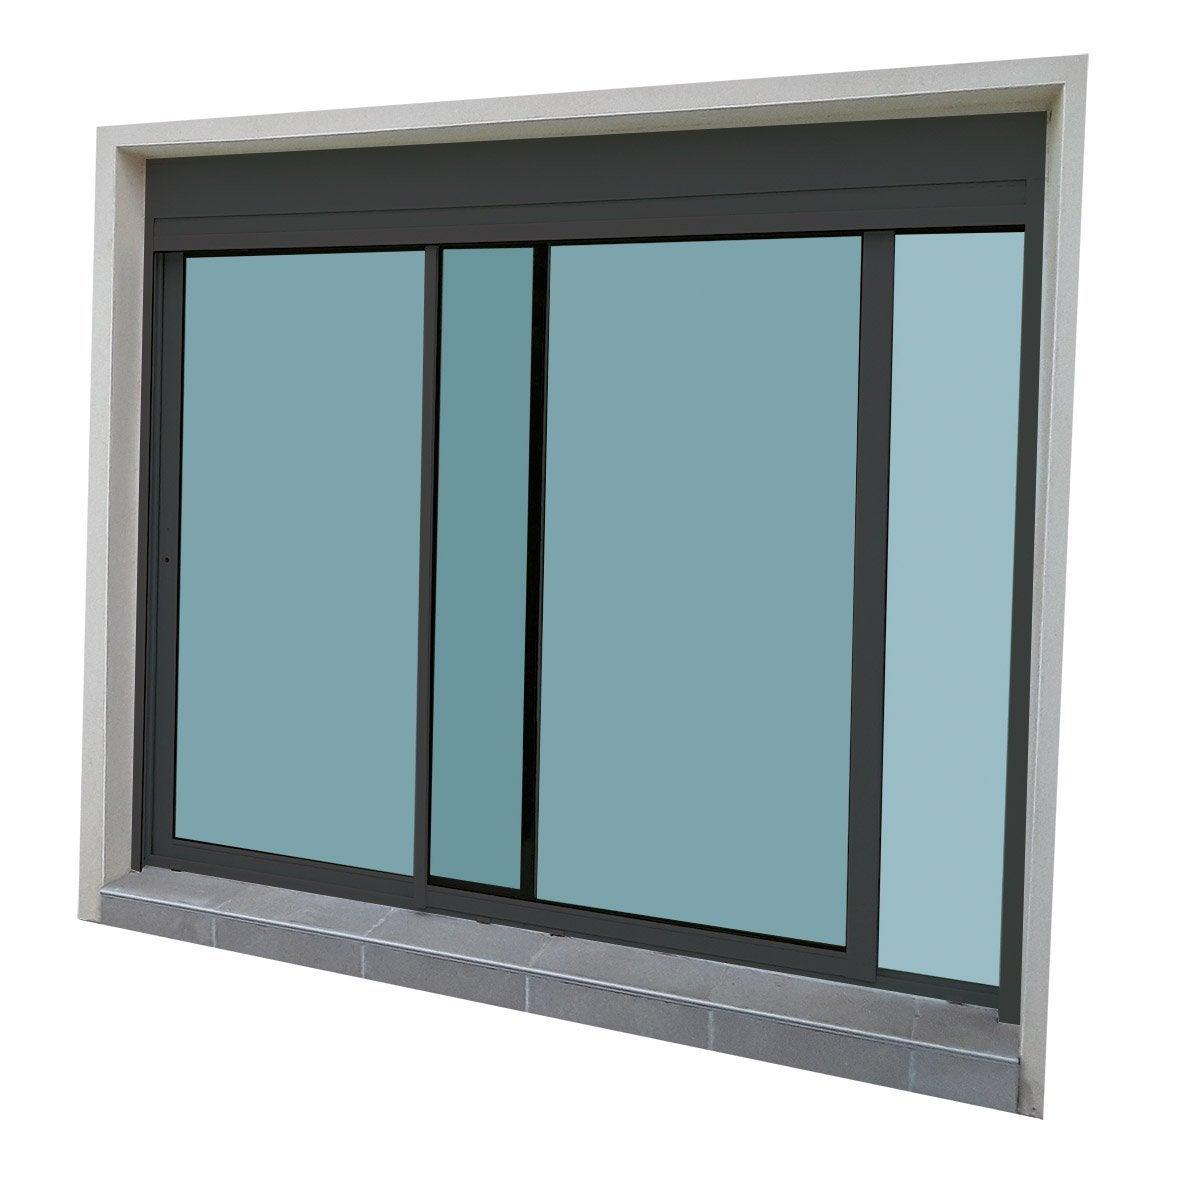 baie vitrée aluminium avec volet roulant brico essentiel, h.200 x l